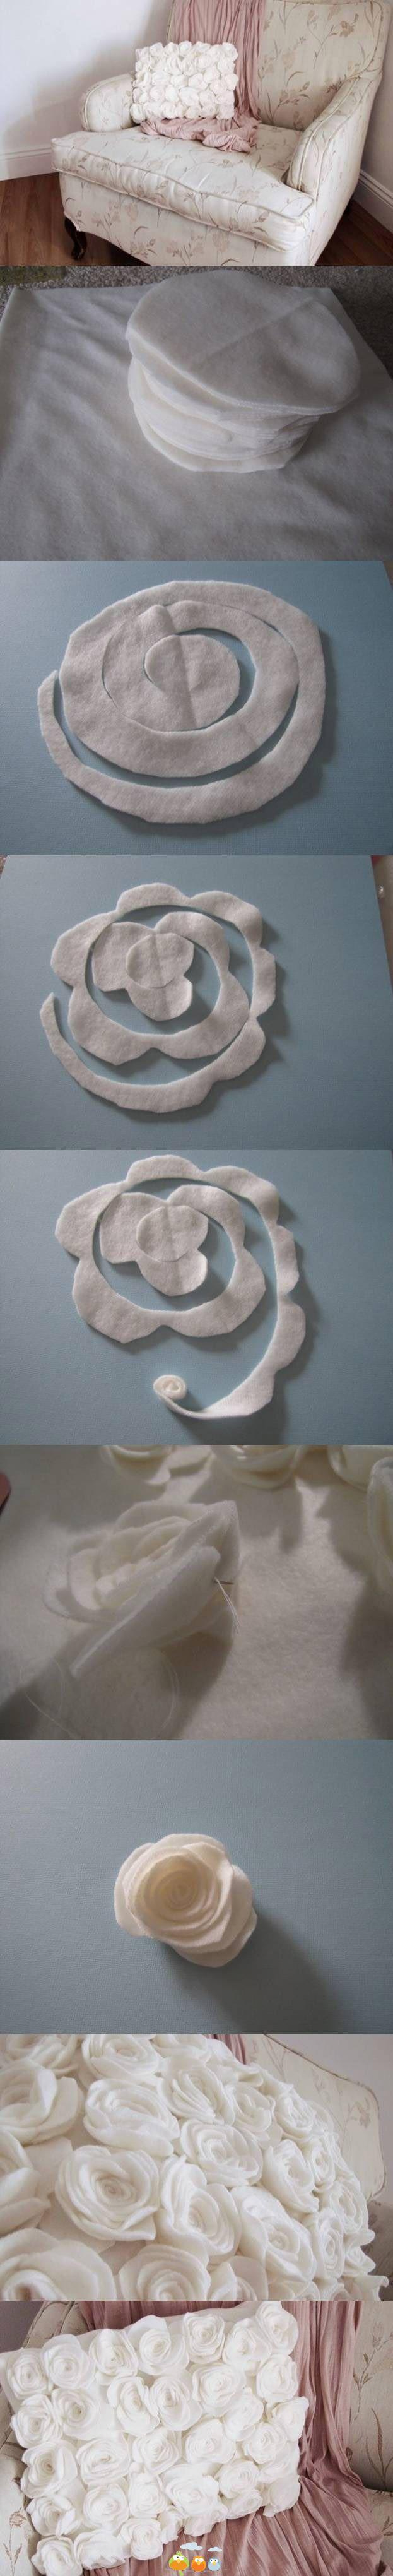 Als grundidee how to make felt roses for embellishments filzen